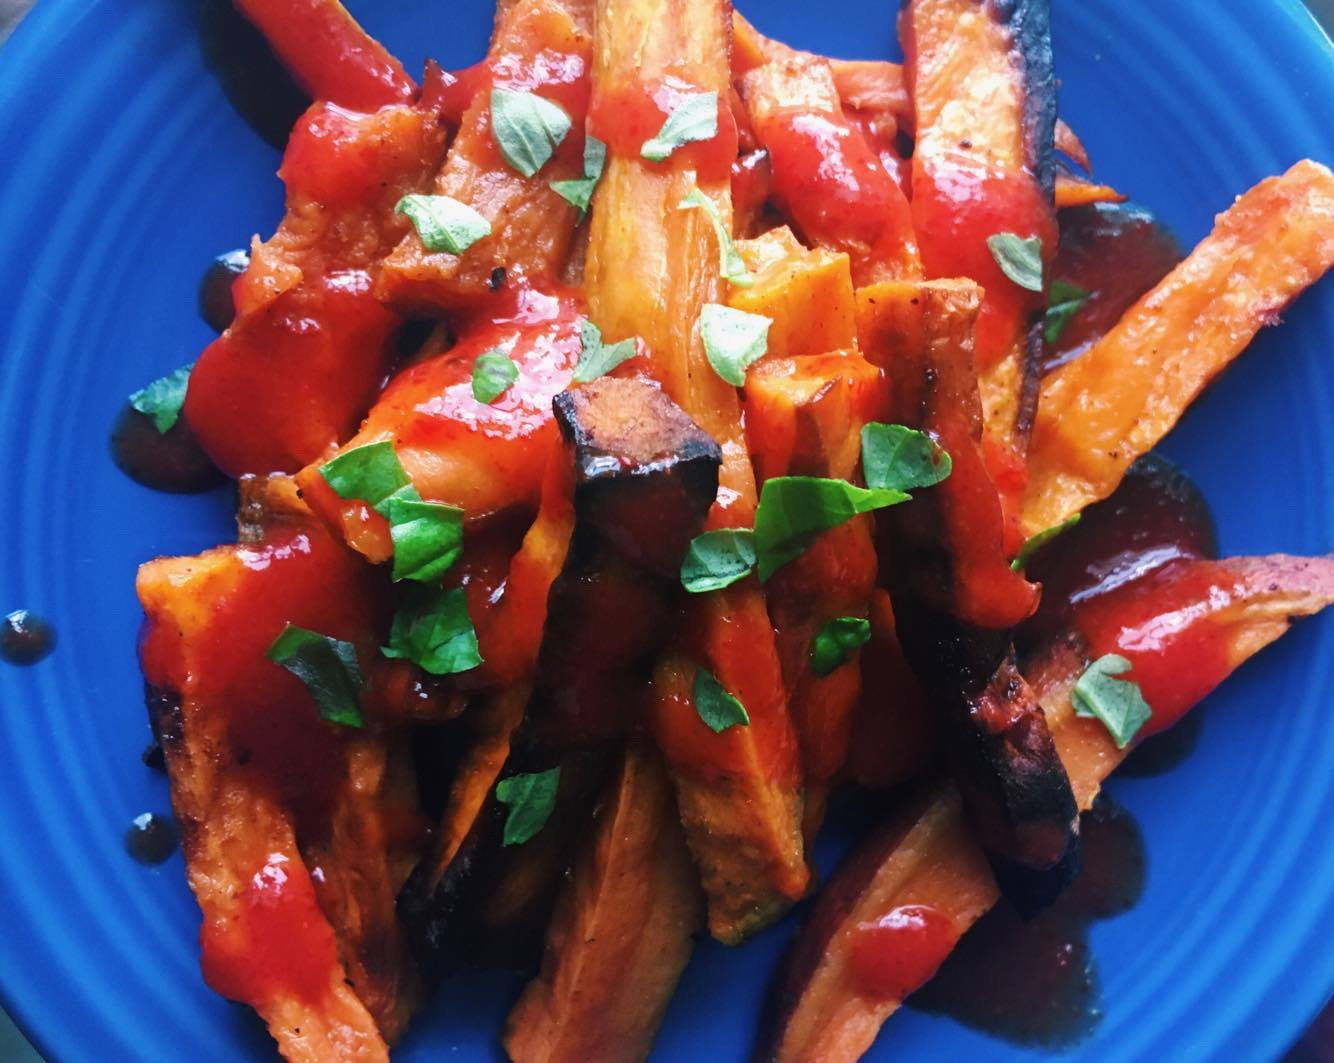 Crispy Sweet Potato Fries - Homemade